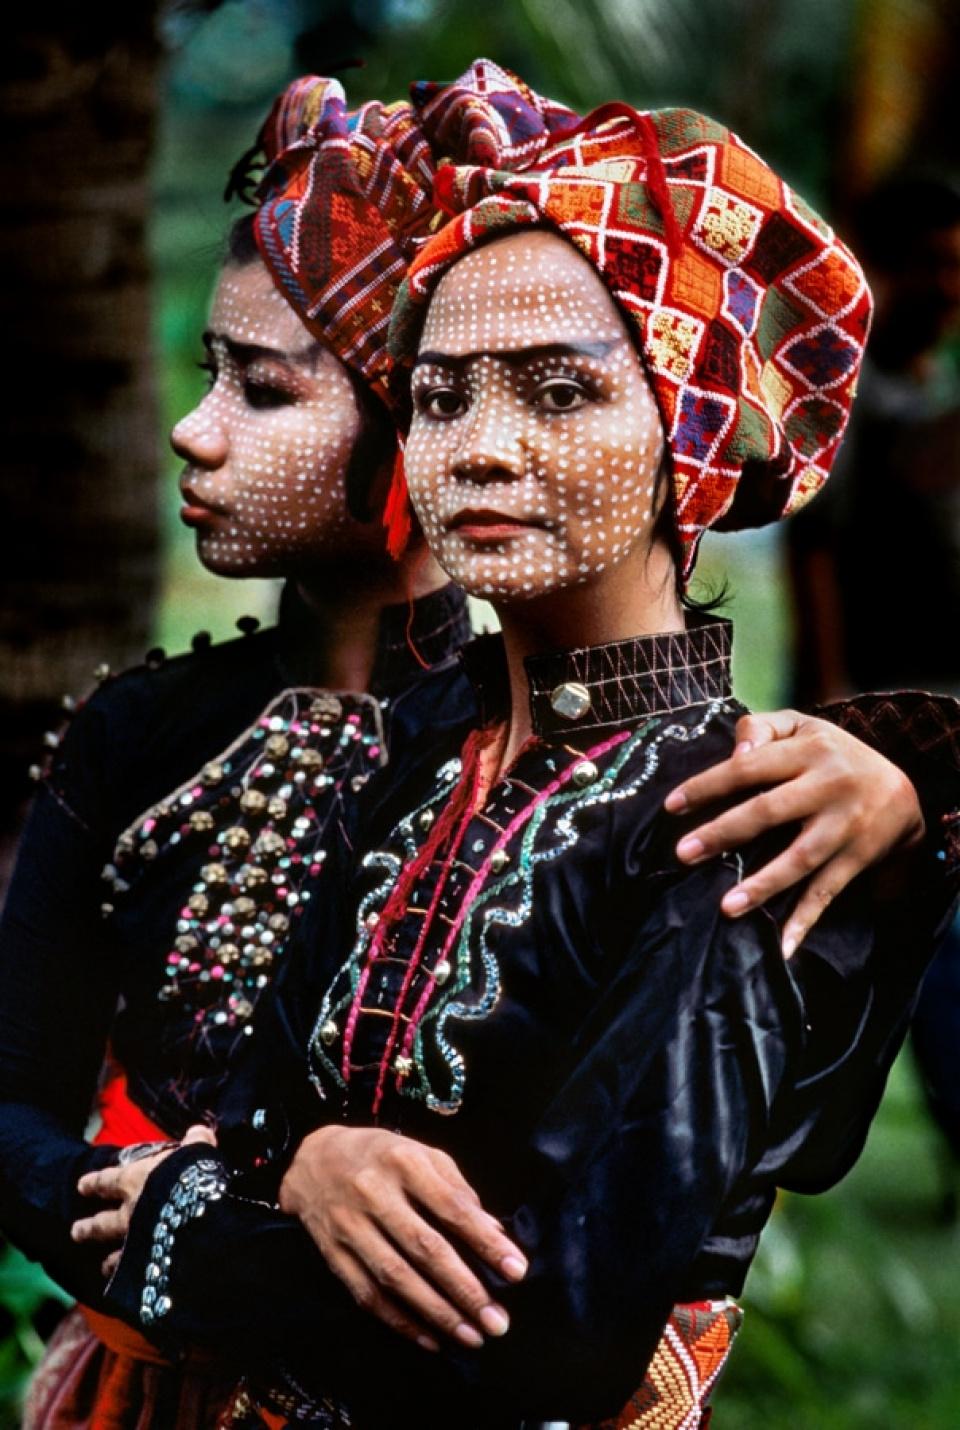 Steve McCurry. Philippines (1985)